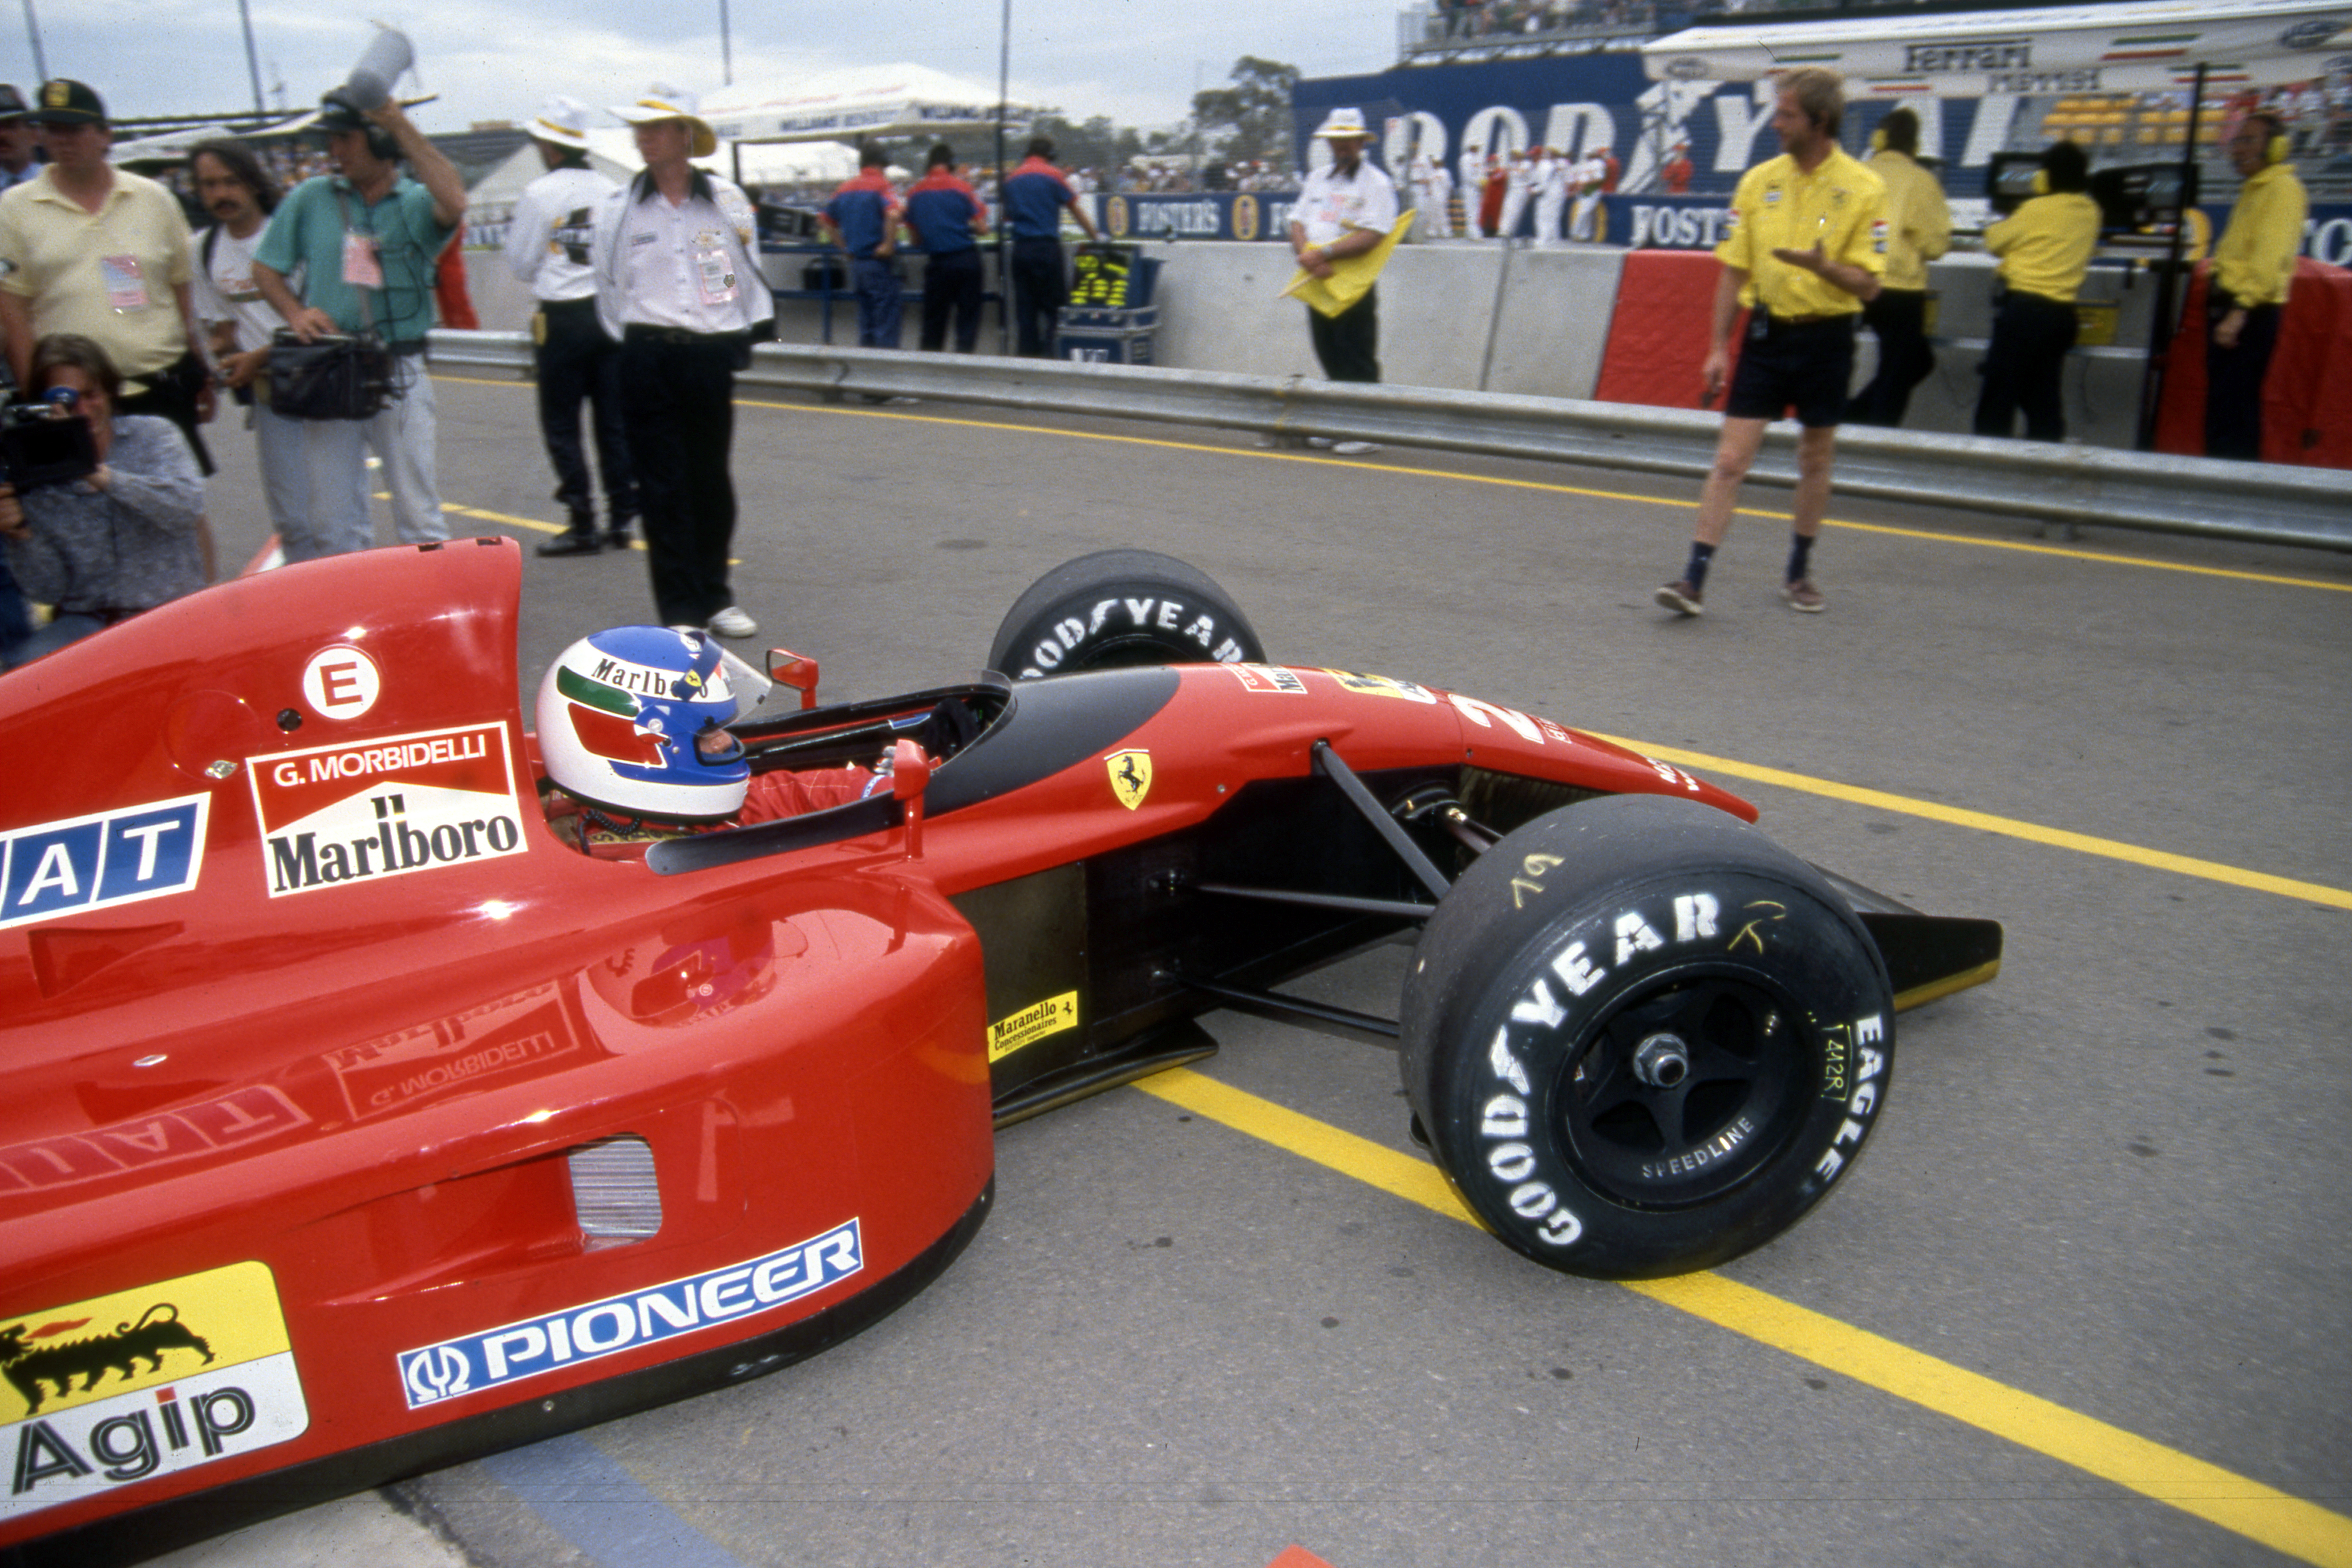 Gianni Morbidelli Ferrari 1991